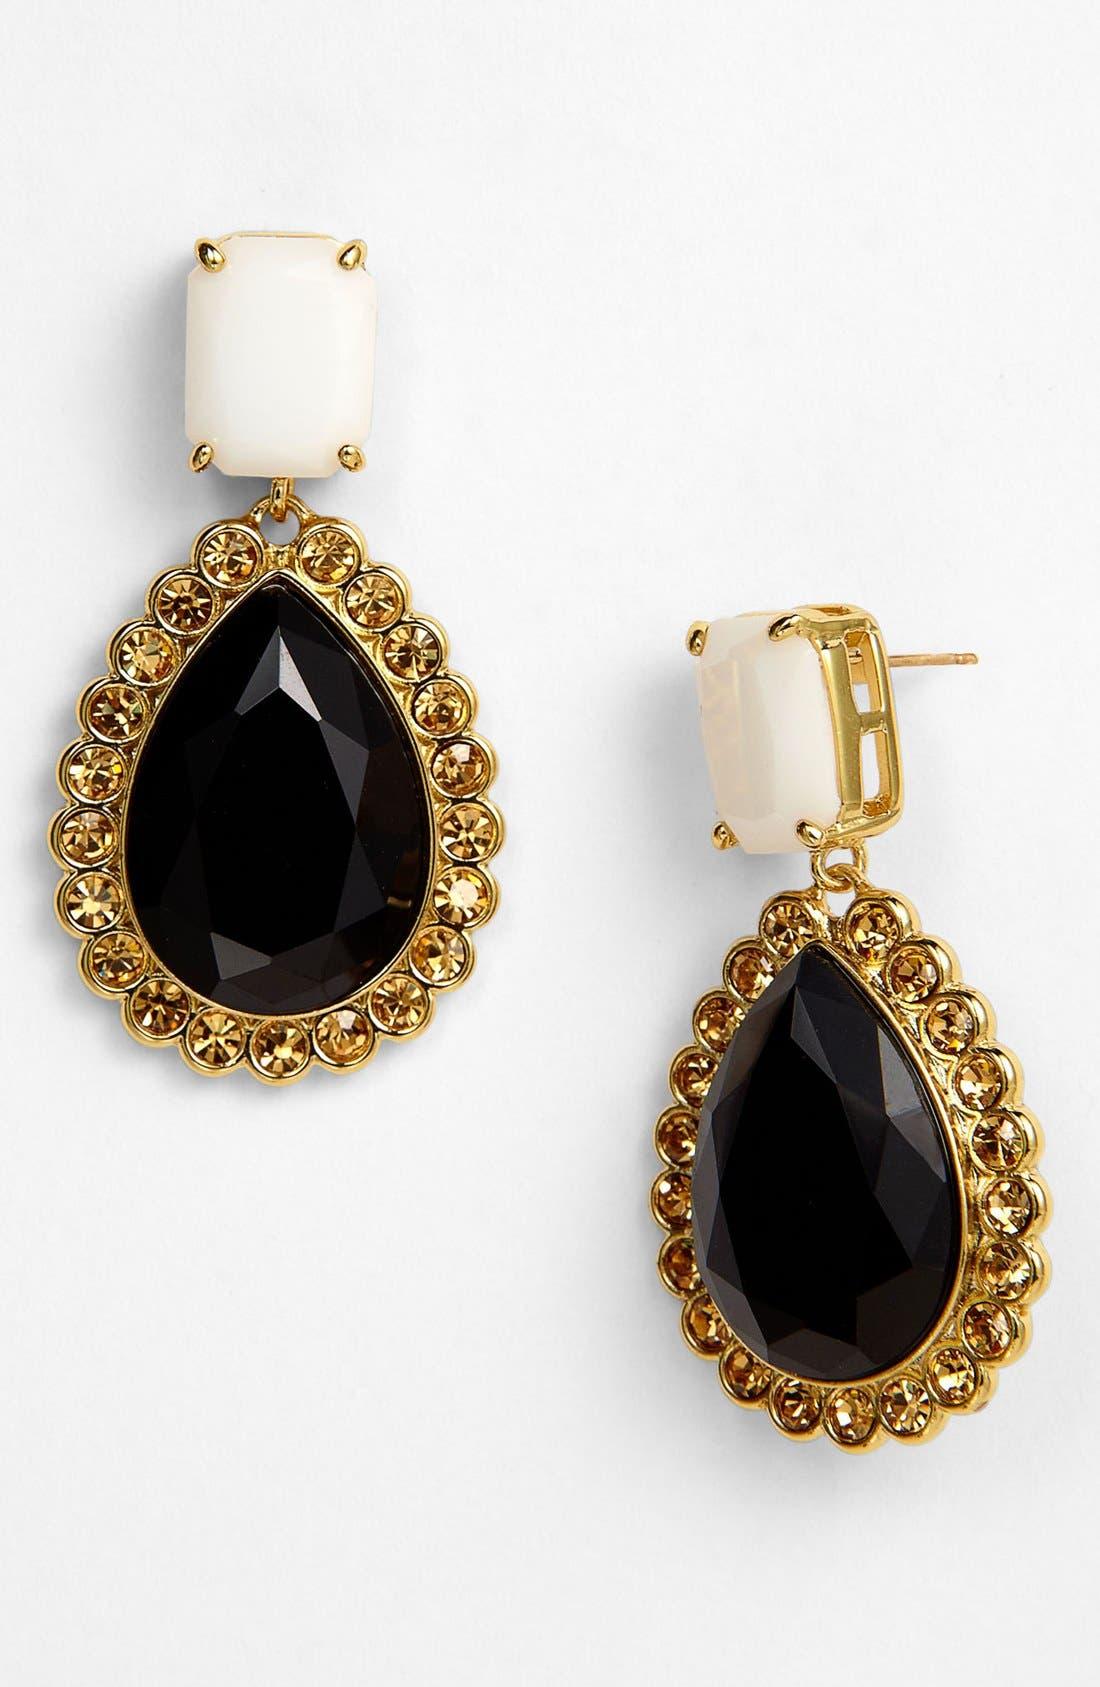 Main Image - kate spade new york 'run around' framed stone earrings